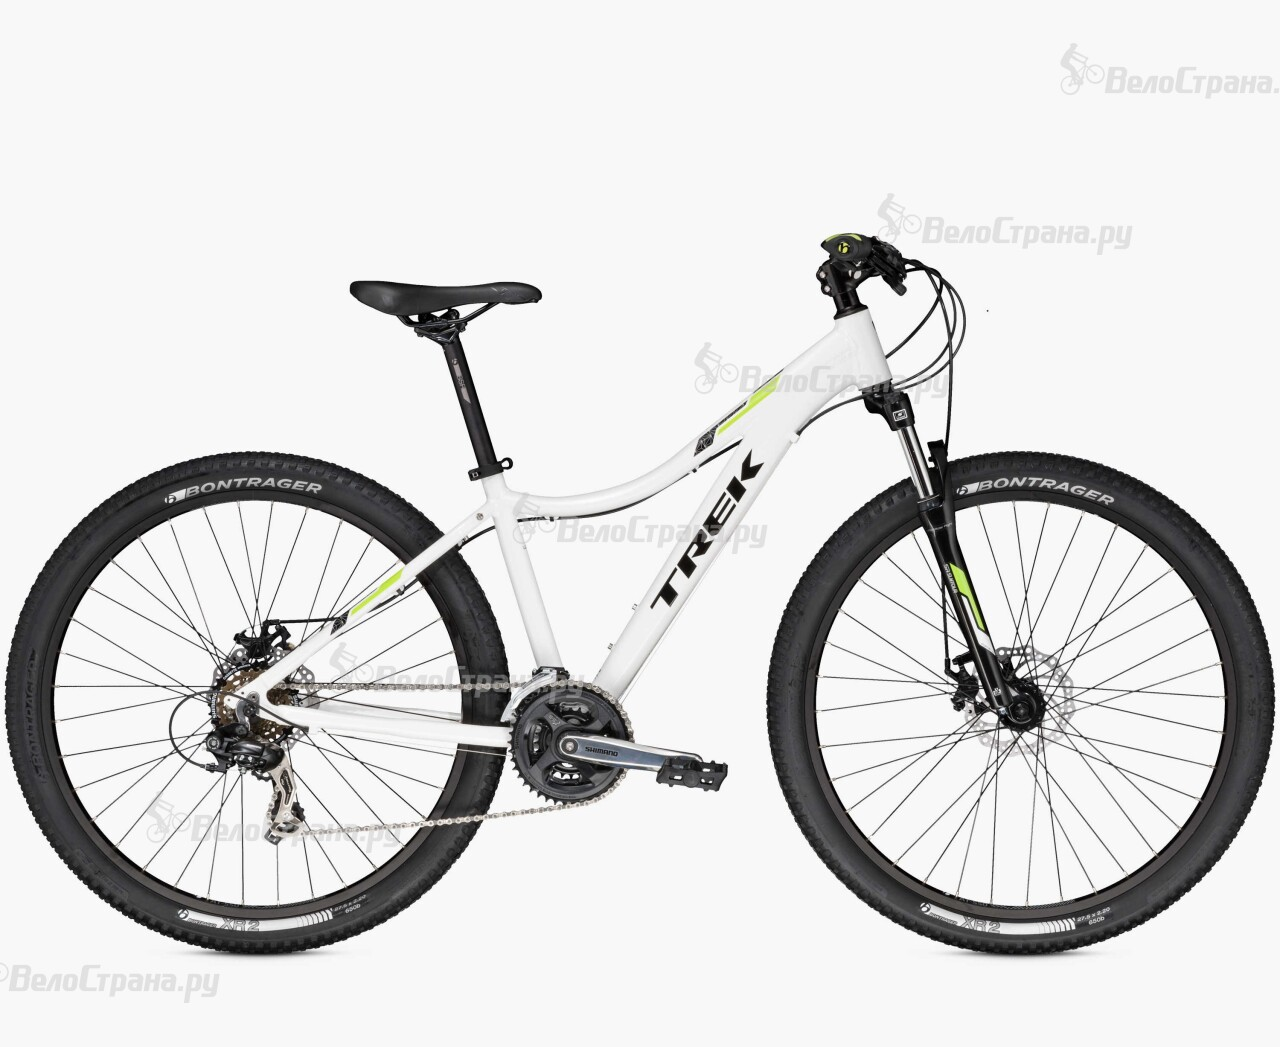 все цены на Велосипед Trek Skye S Women's 29 (2016) онлайн